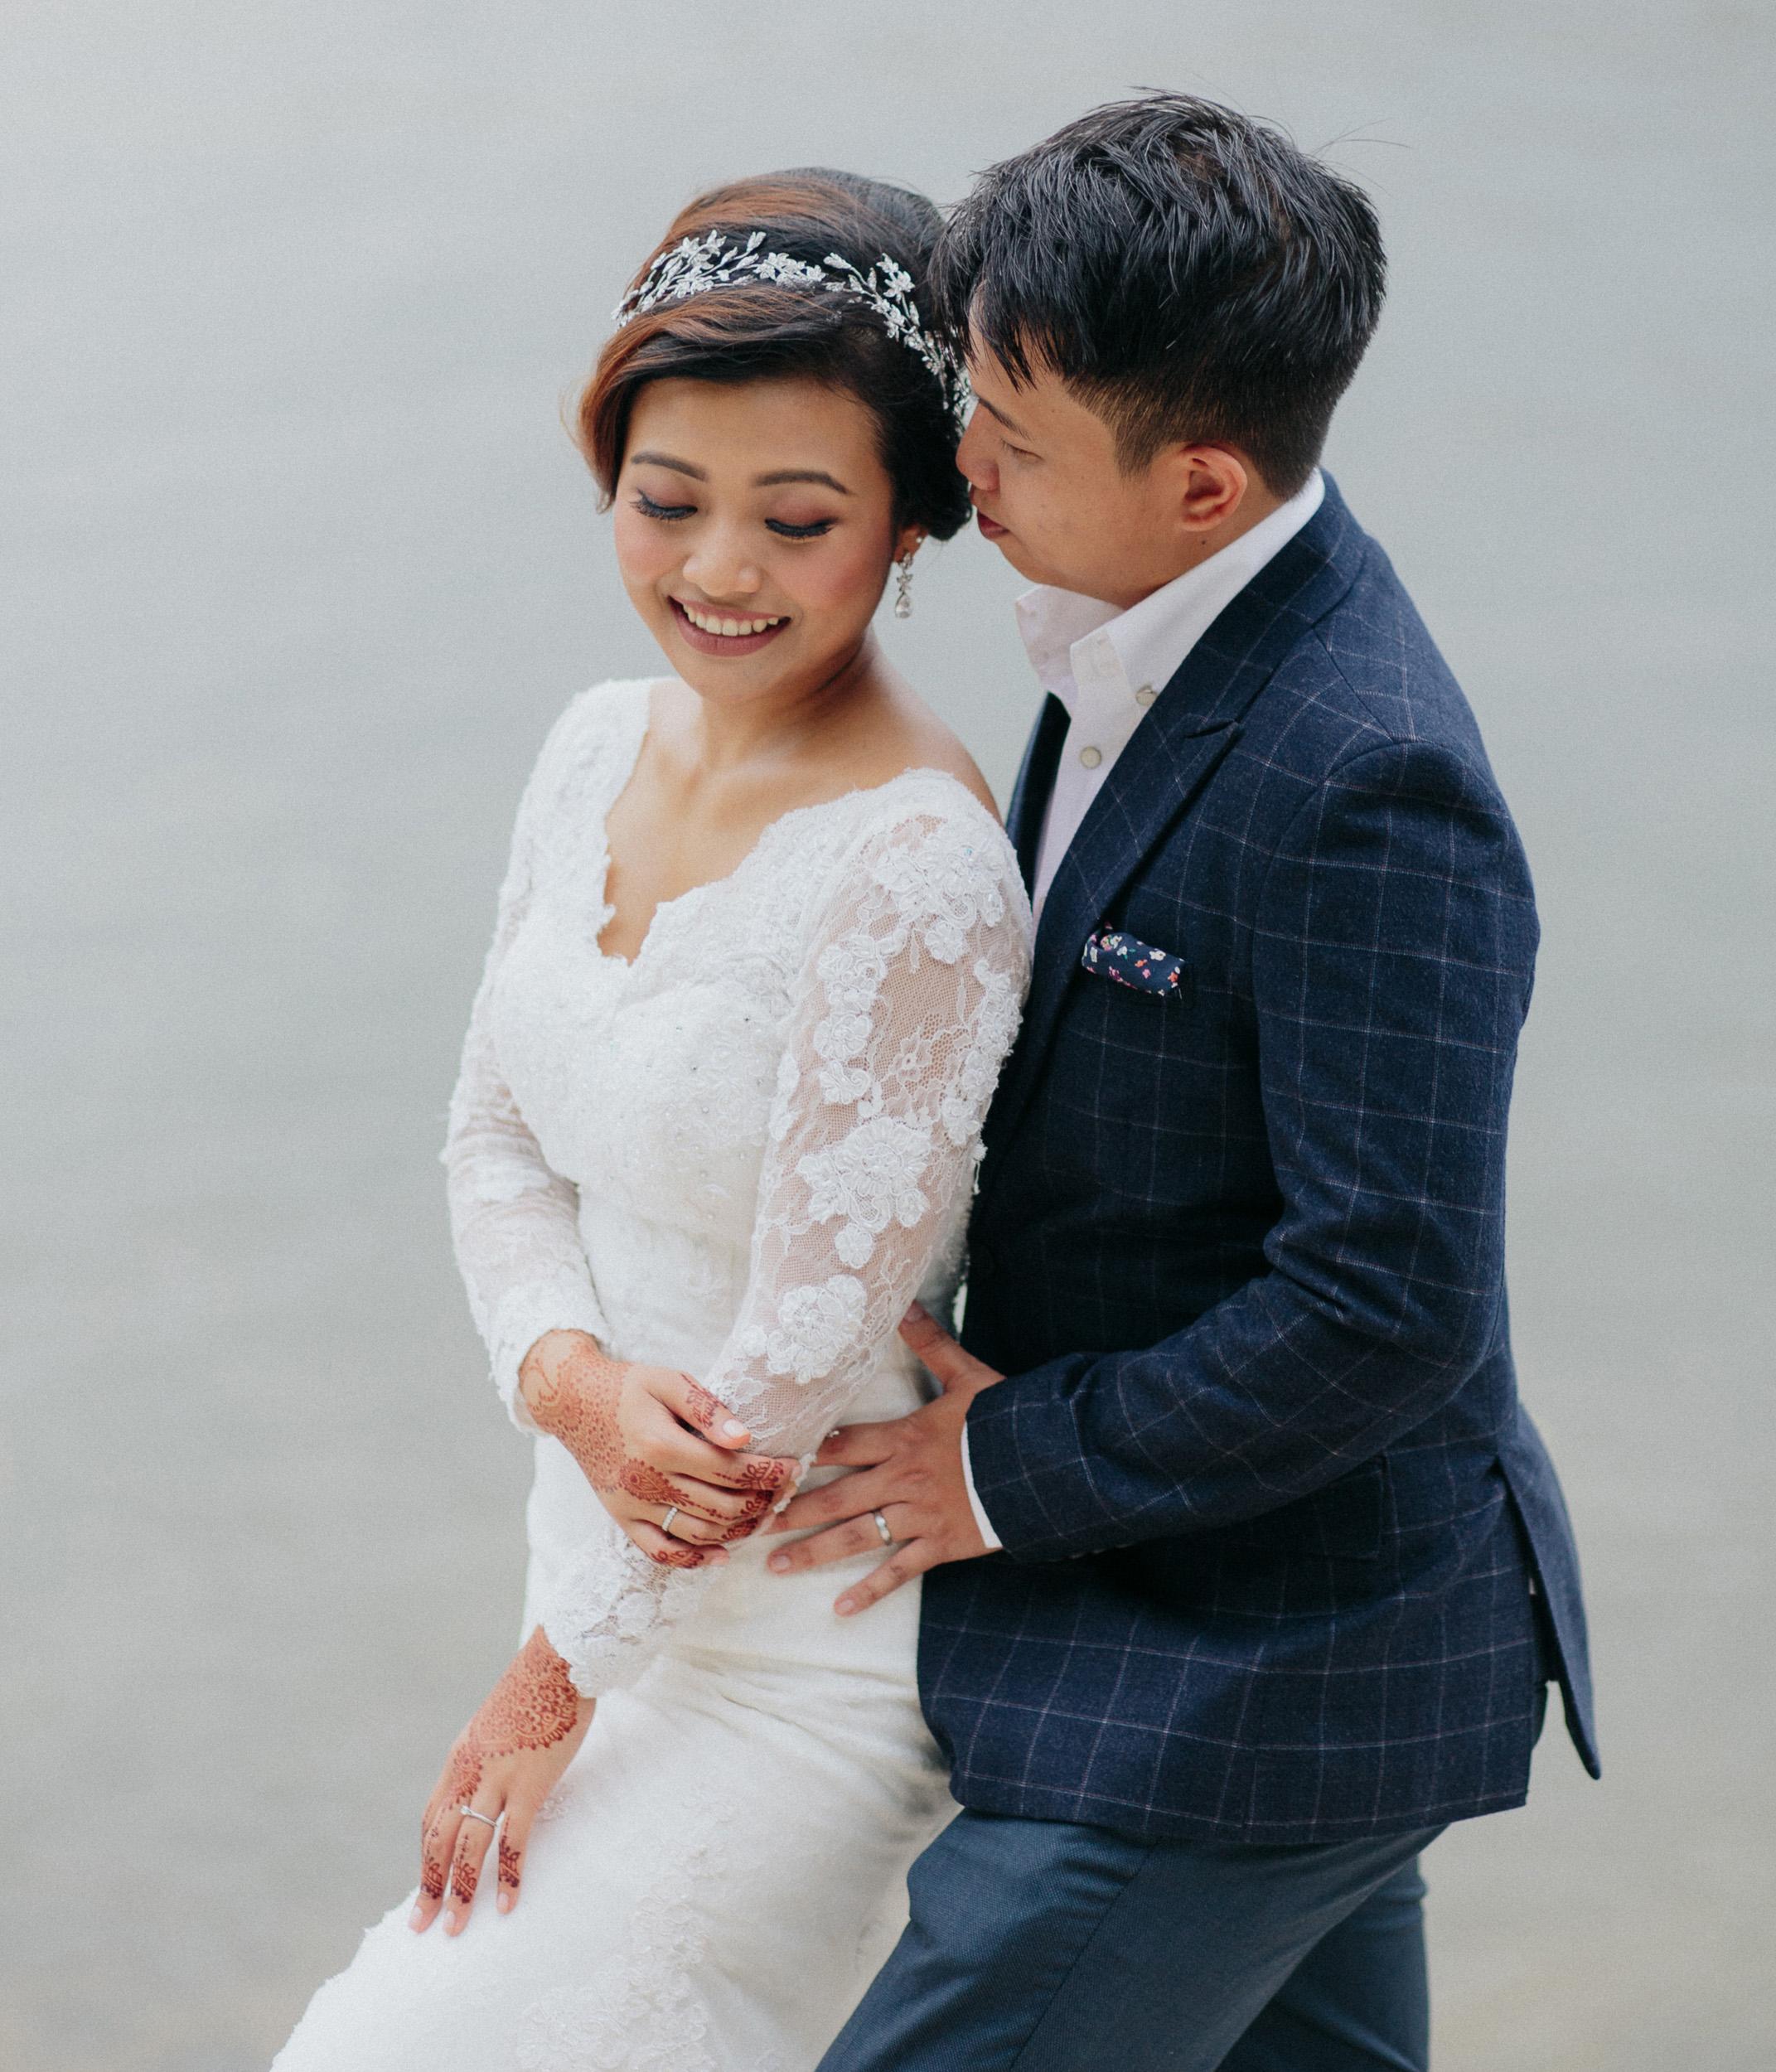 singapore-wedding-photographer-photography-wmt2017-080.jpg